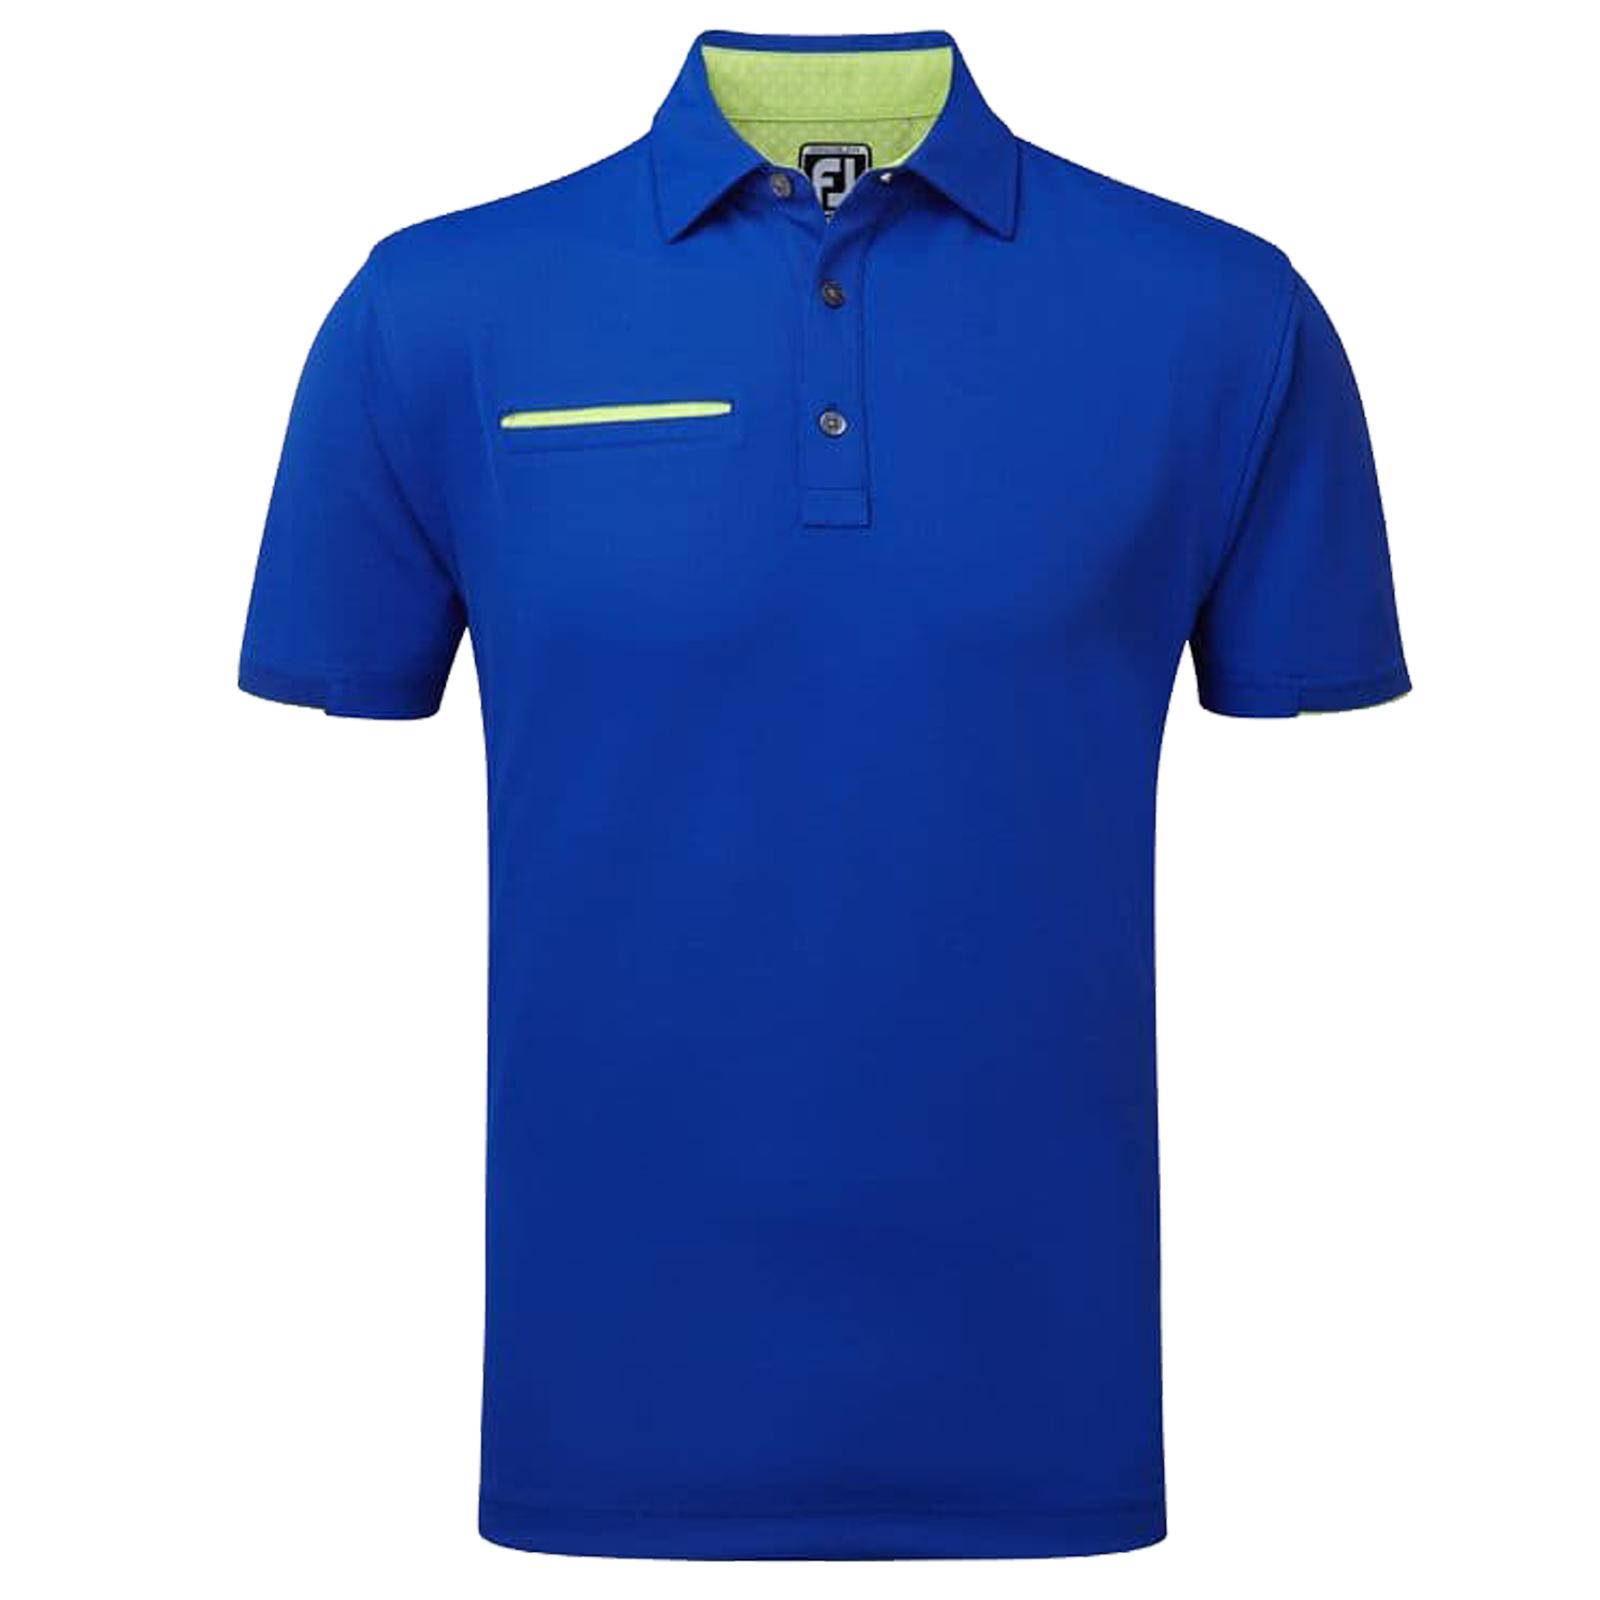 Footjoy 2017 clearance golf polo shirts loads of styles for Golf shirt vs polo shirt